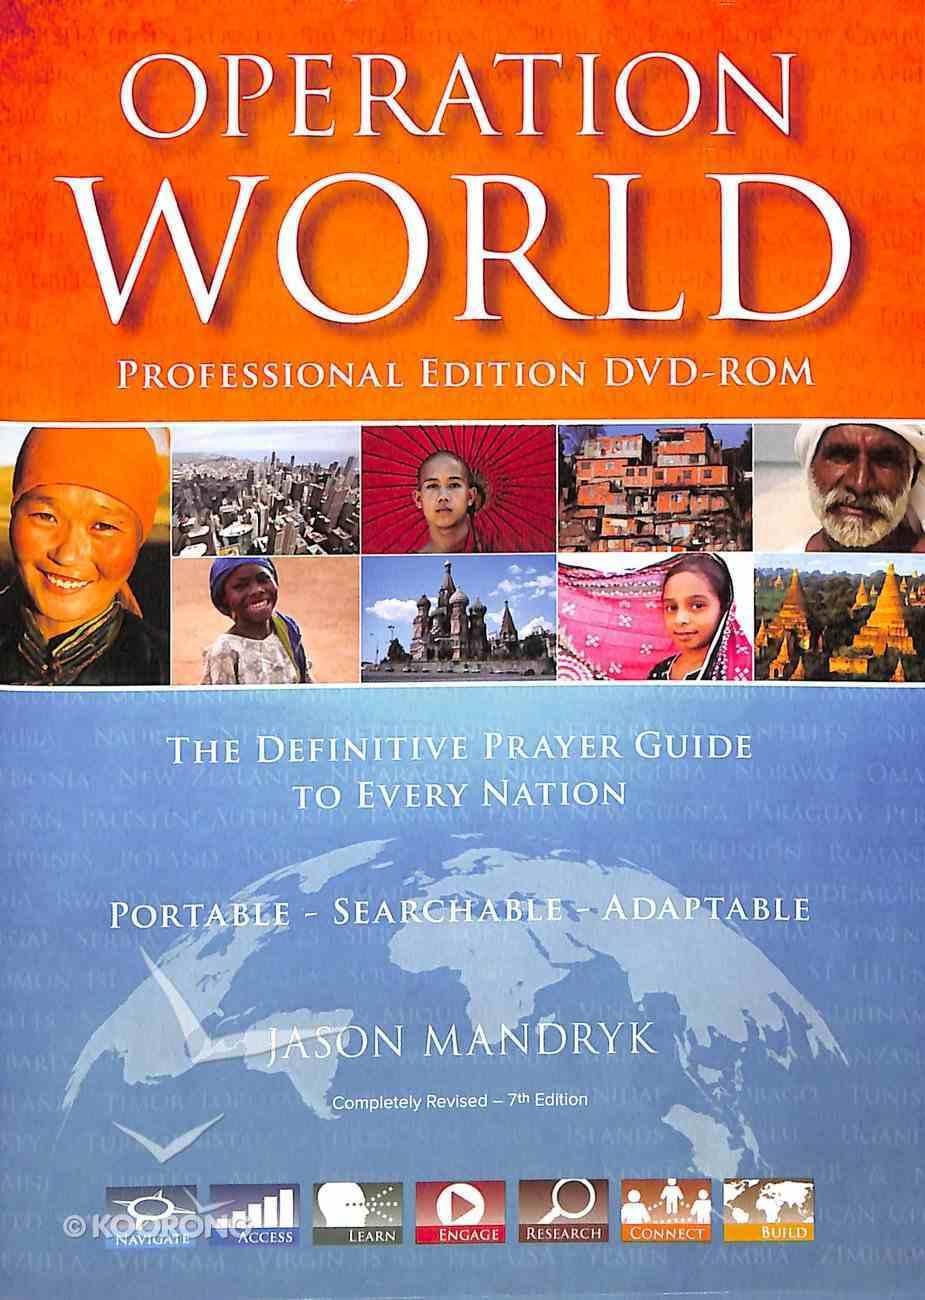 Operation World Professional Edition (7th Edition) (Dvd-rom) Dvd-rom